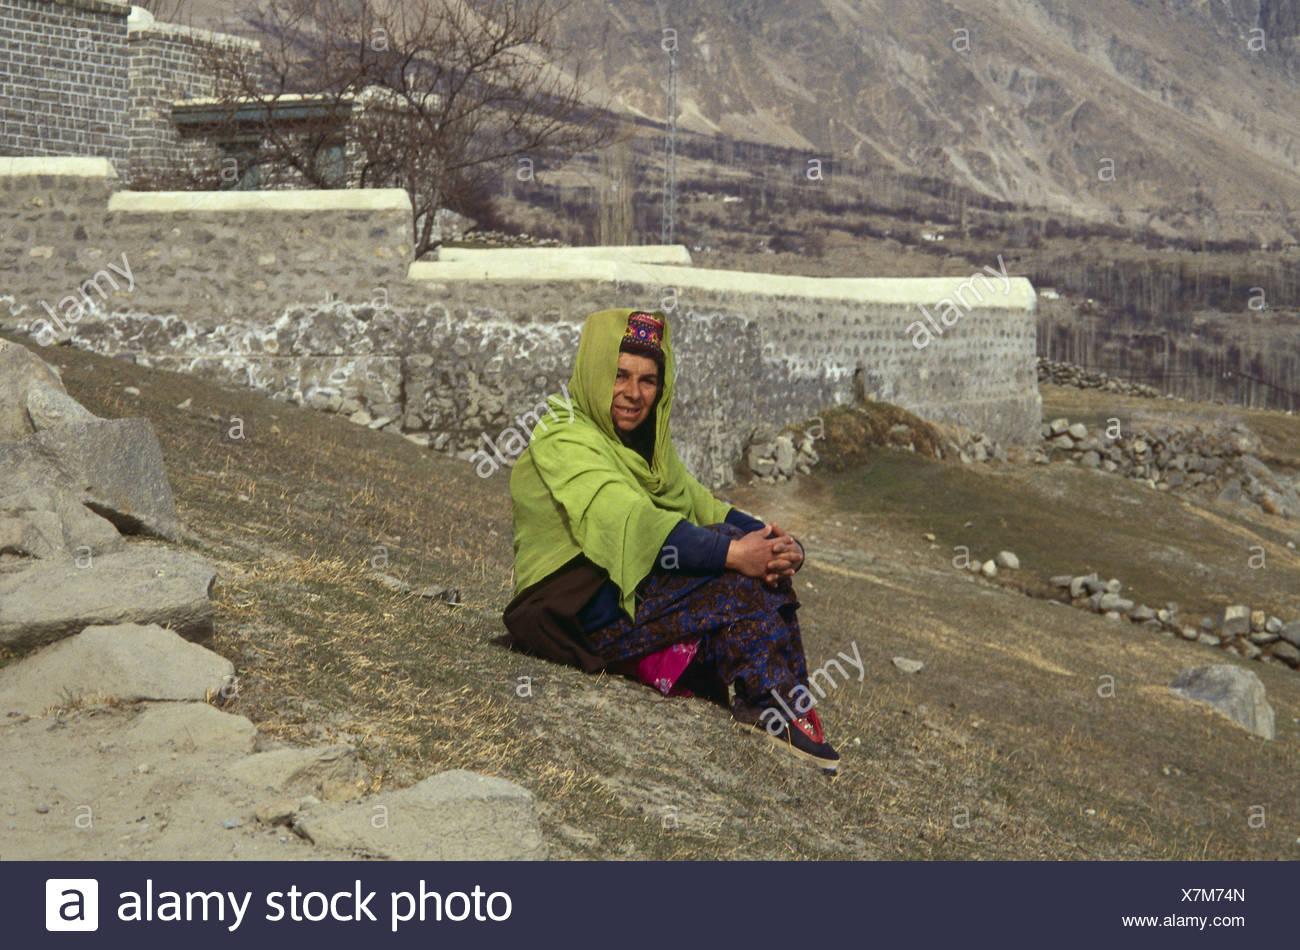 Pakistan,Karimabad,woman,Hunzukuc strain,sit,at the side,no model release,Asia,Karakorumgebirge,Karakorum,Hunzatal,Hunzukuc,tribe,locals,clothes,headgear,traditionally,outside,whole body, - Stock Image